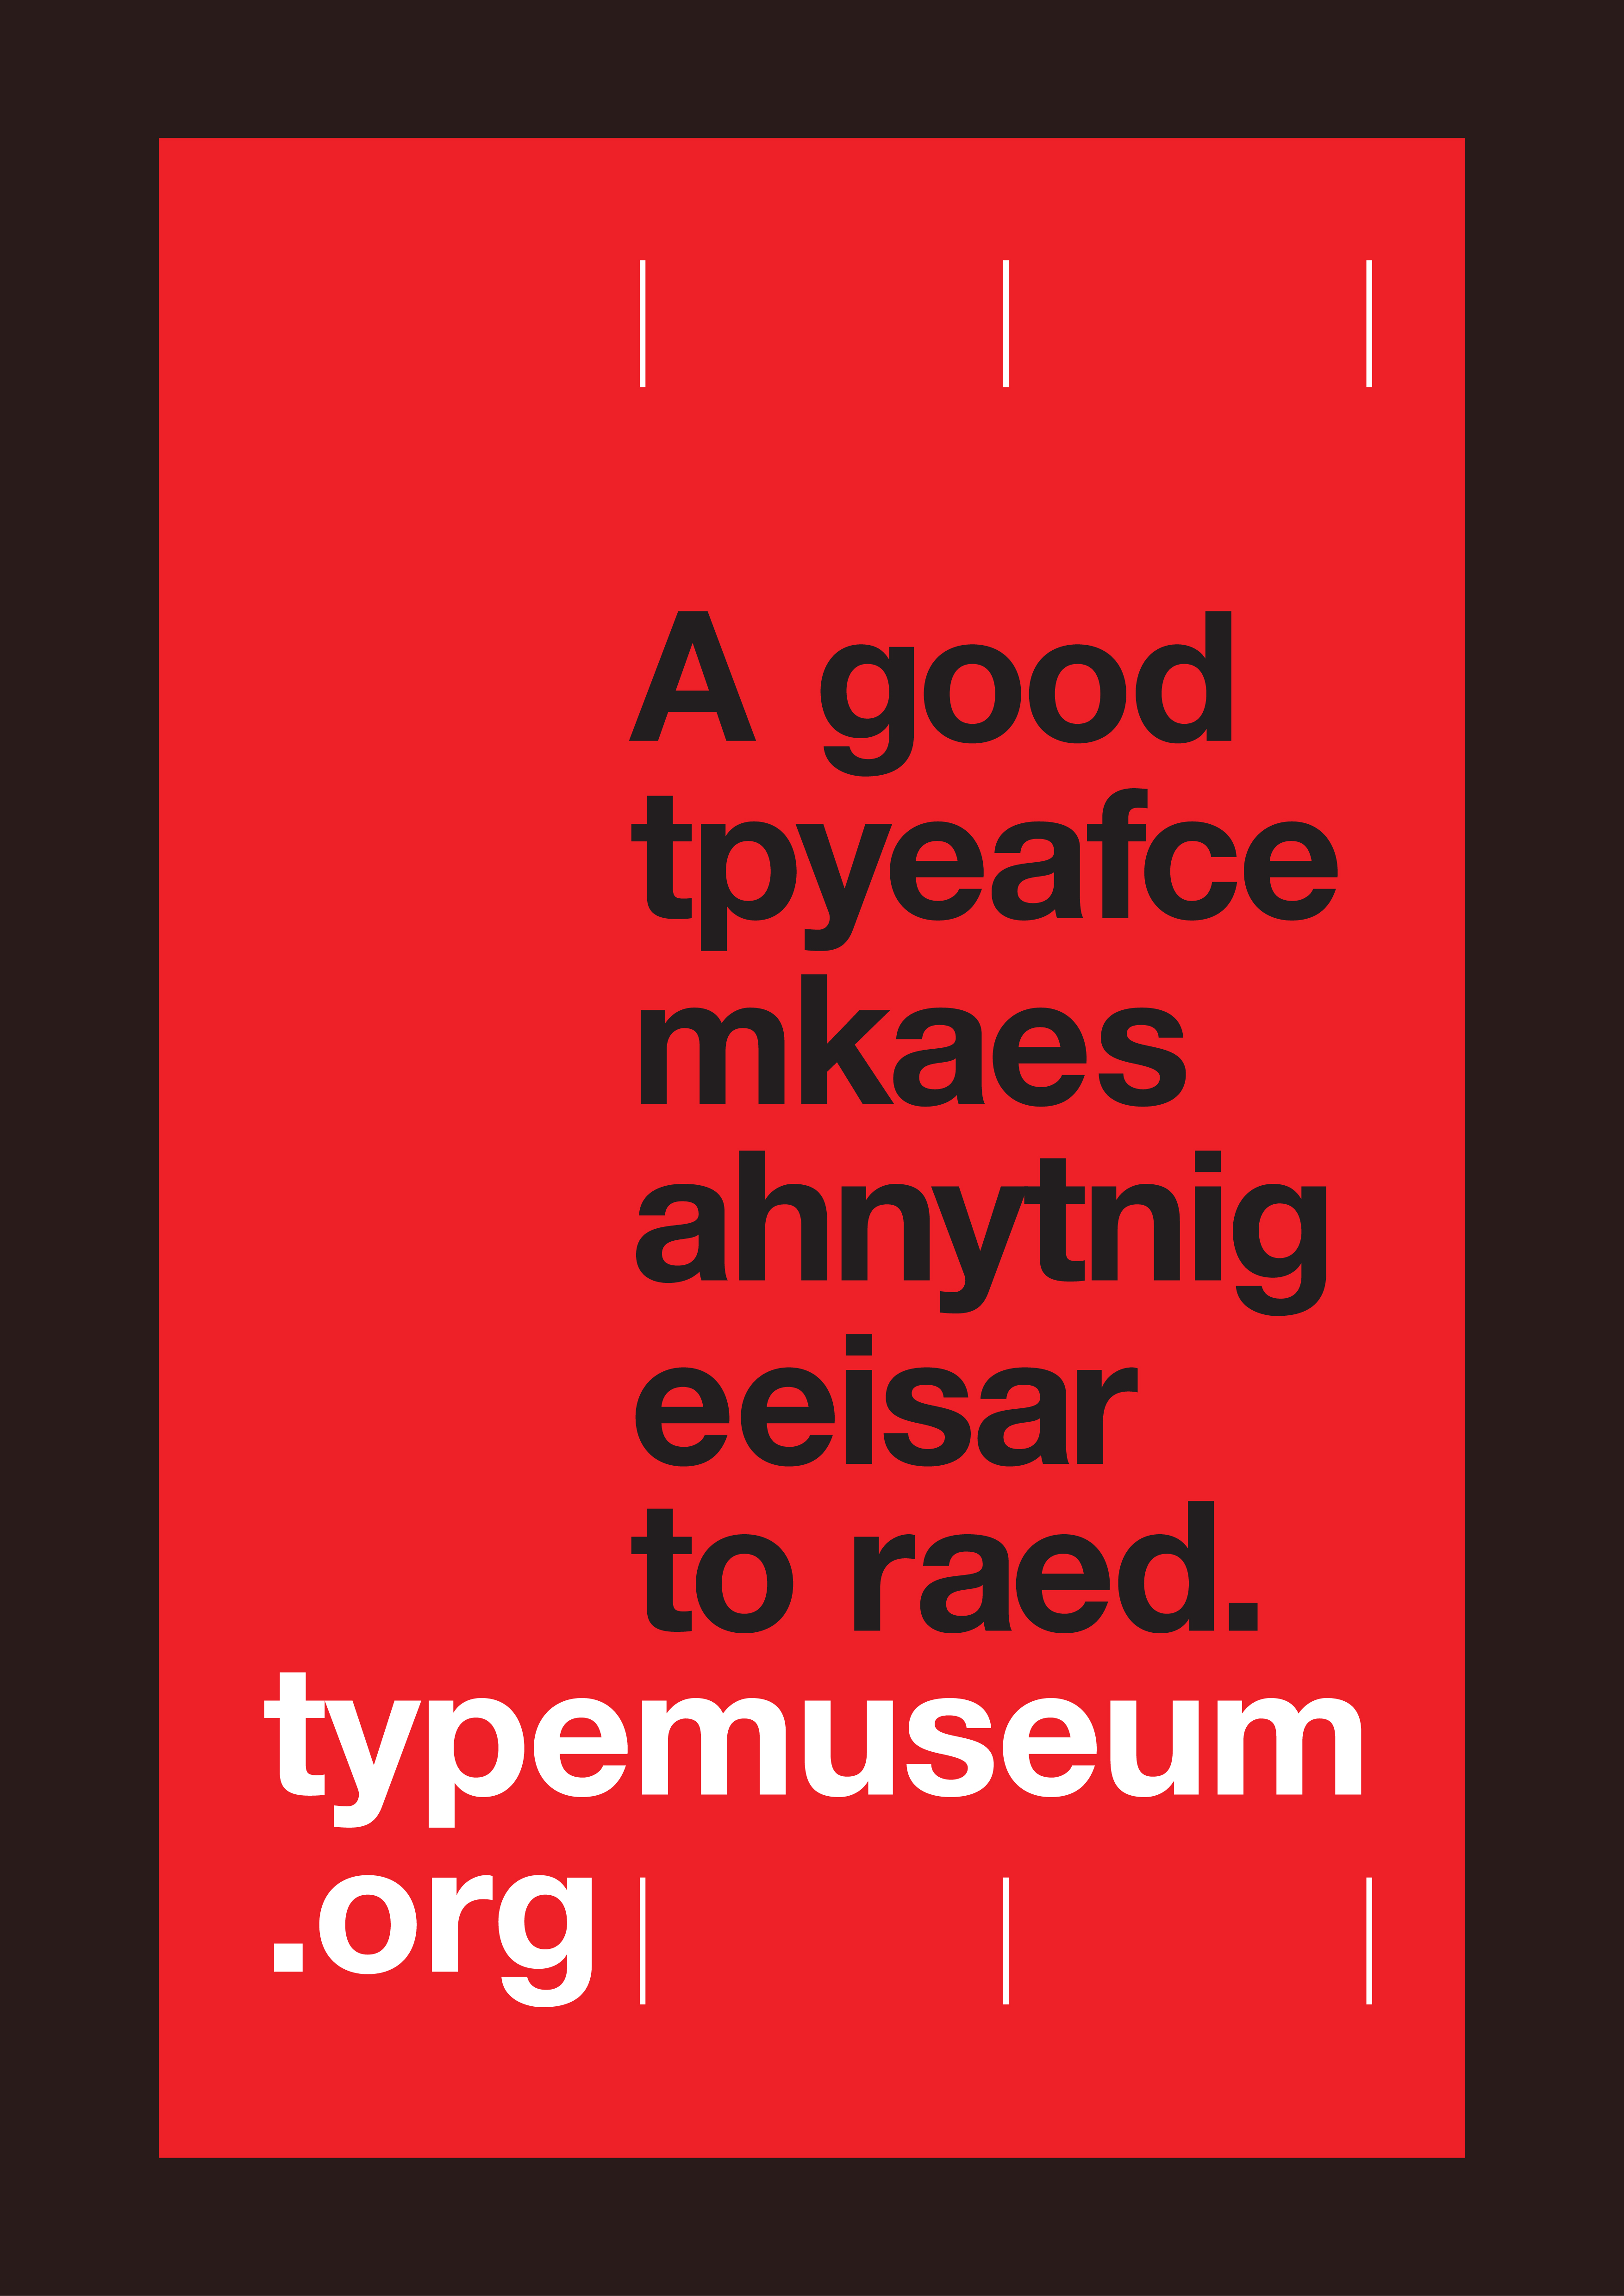 A good tpyeafce mkaes ahnytnig eeisar to raed - typemuseum.org